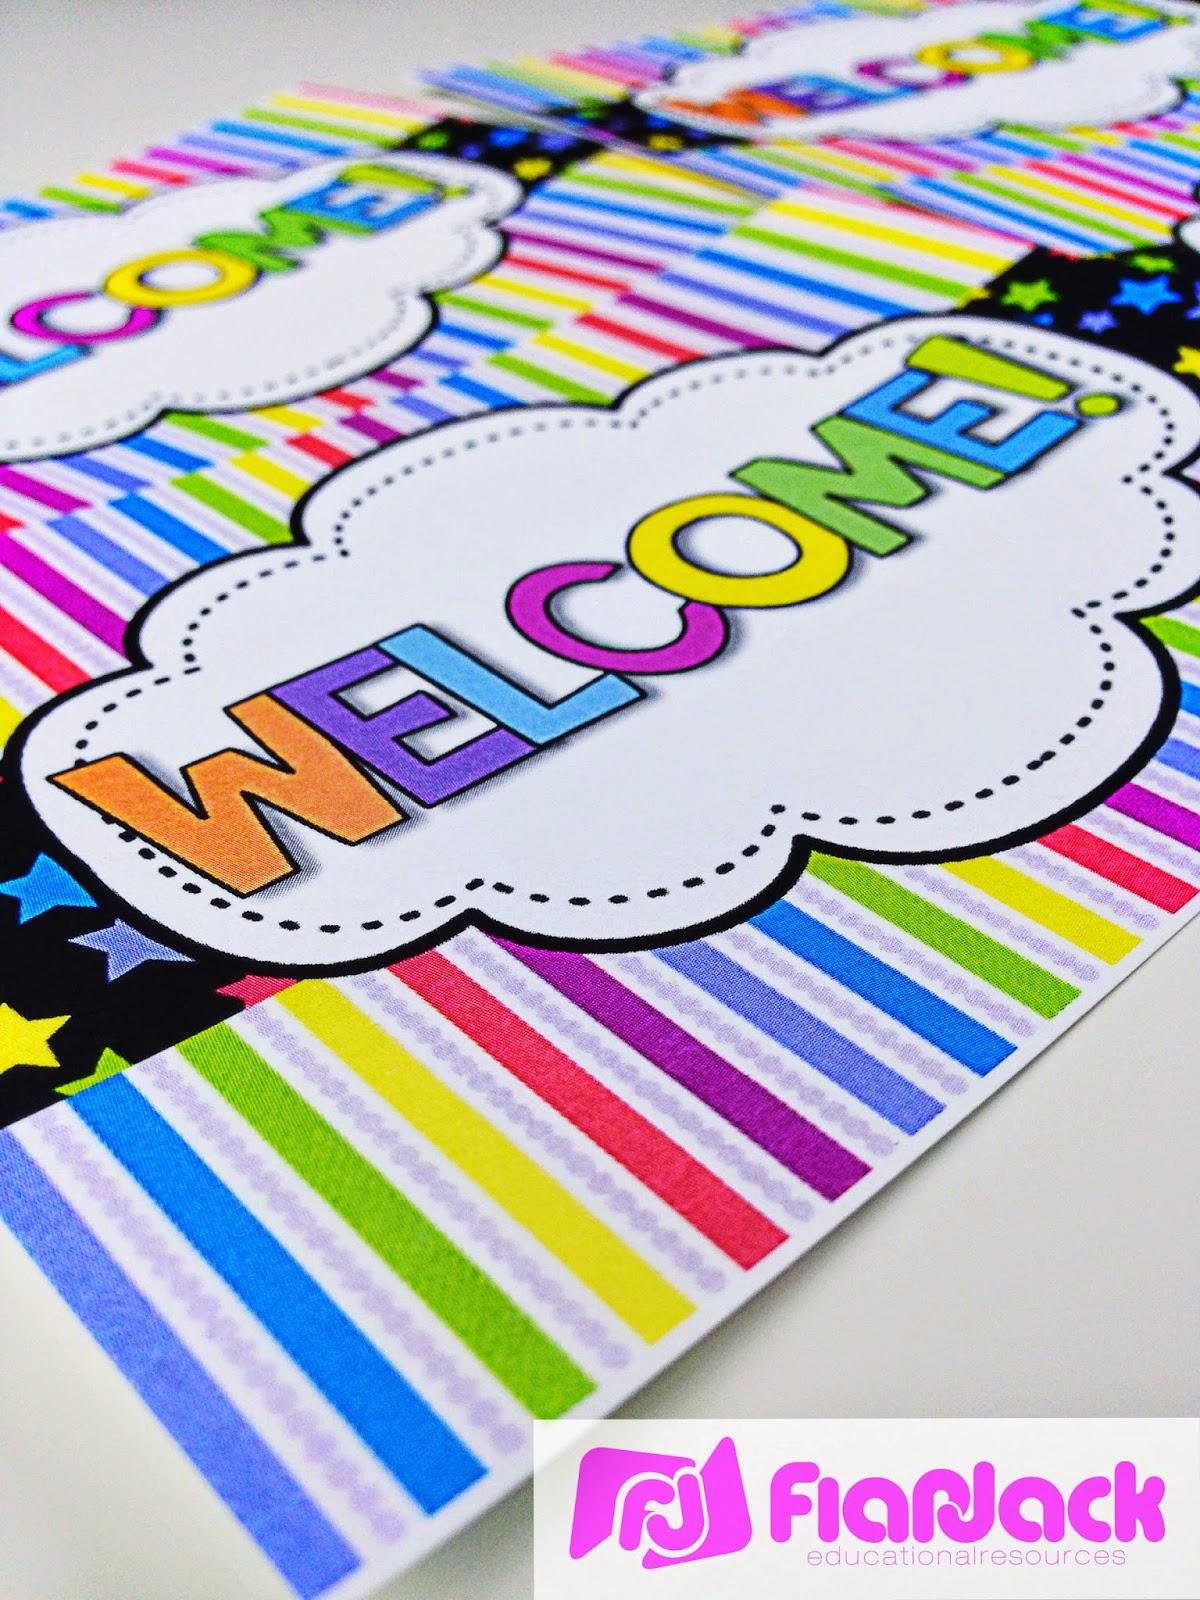 Classroom Decor Packs ~ Flapjack educational resources thank you gracias cards